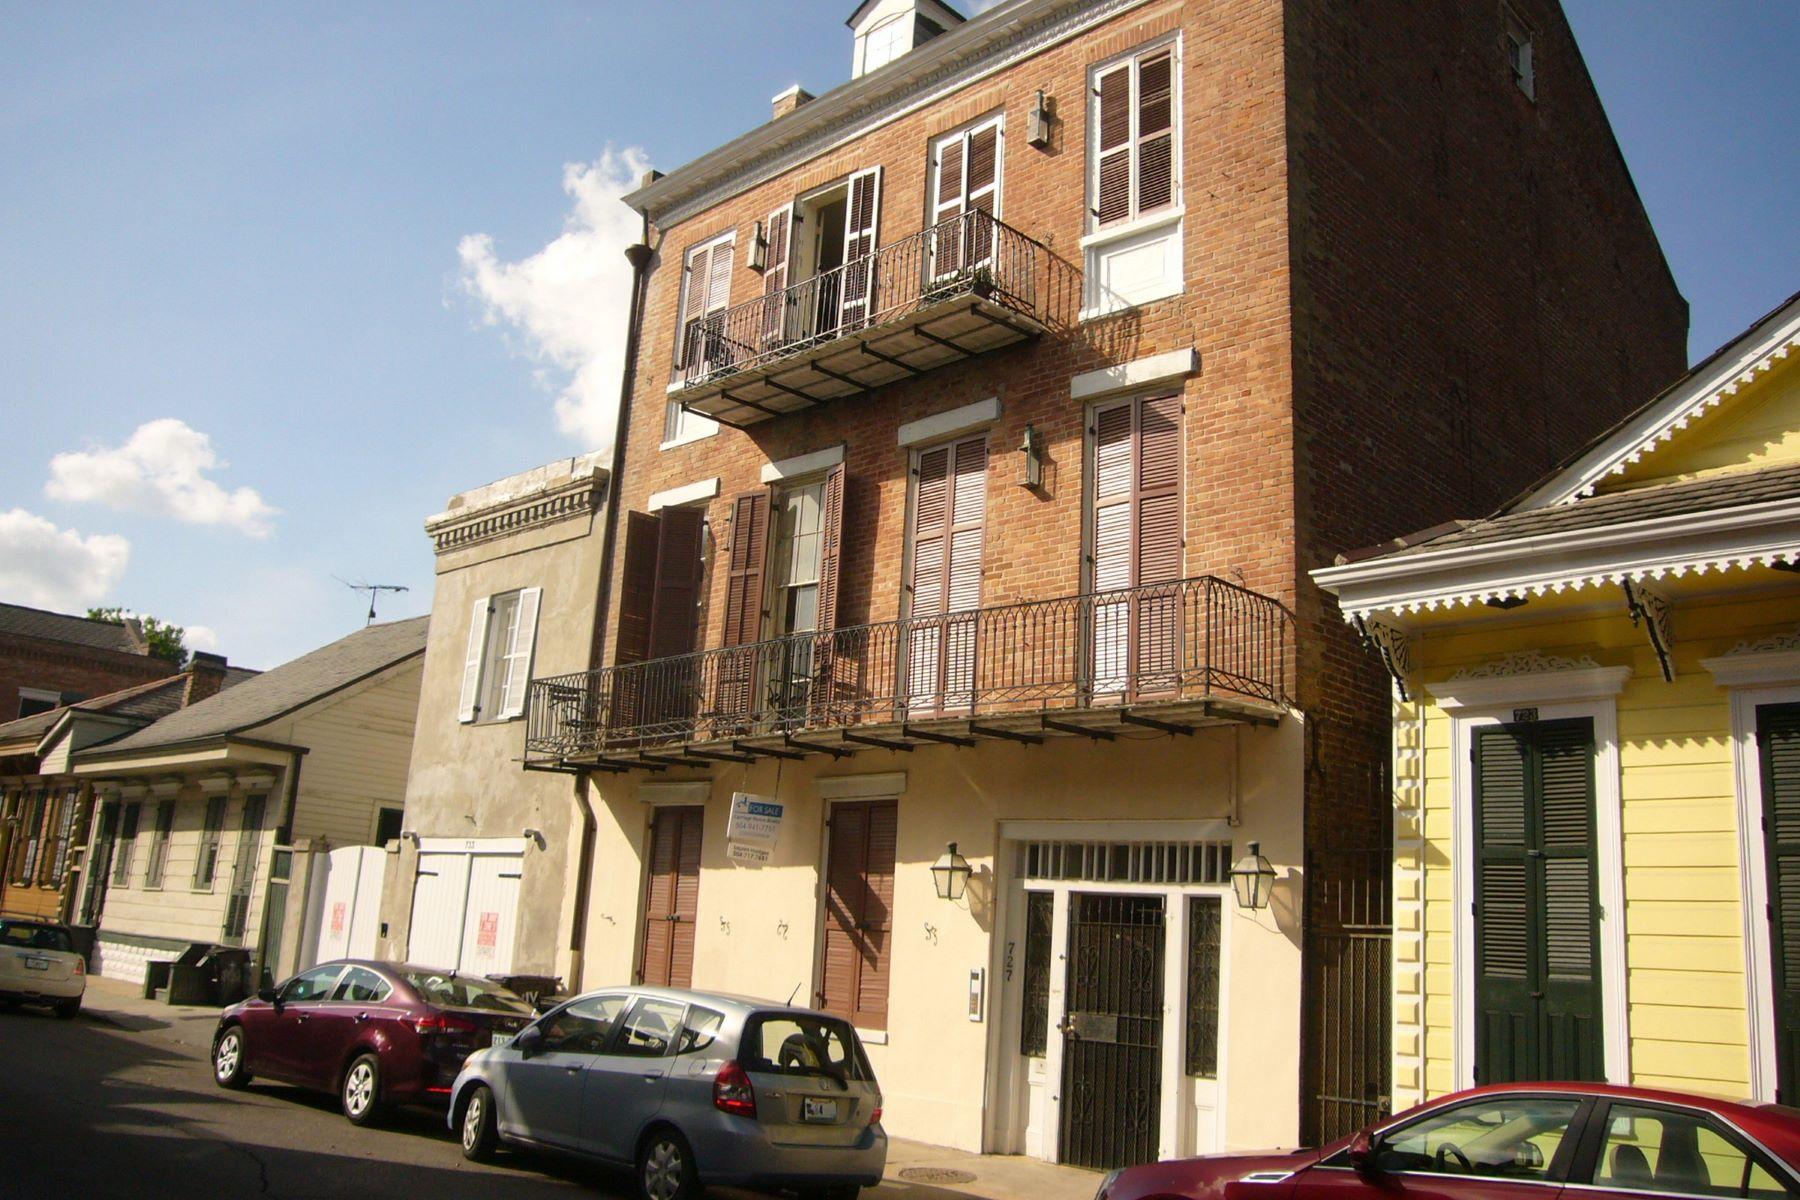 Condominium for Sale at 727 Barracks Street, #5 727 Barracks St #5 New Orleans, Louisiana 70116 United States